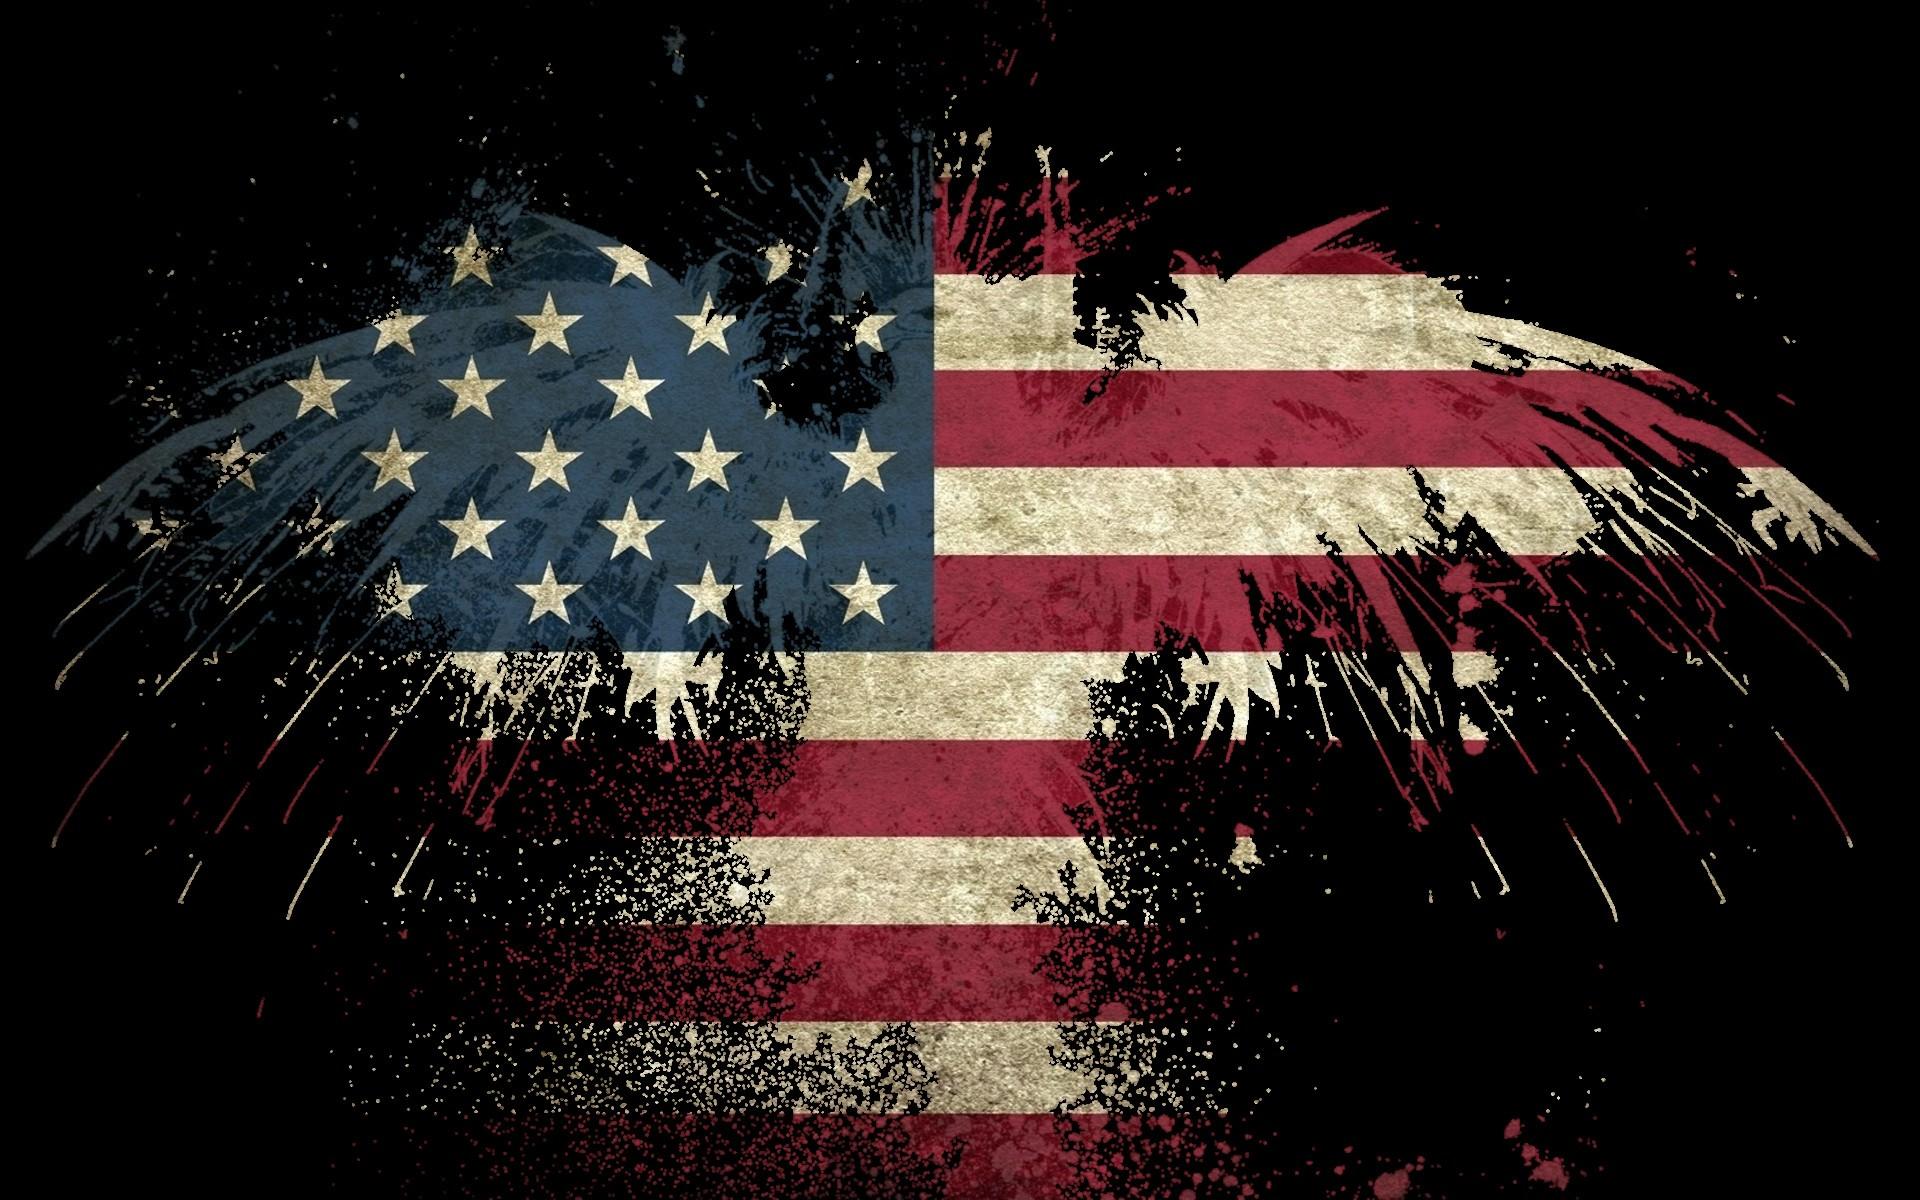 USA America flag eagle wallpaper background